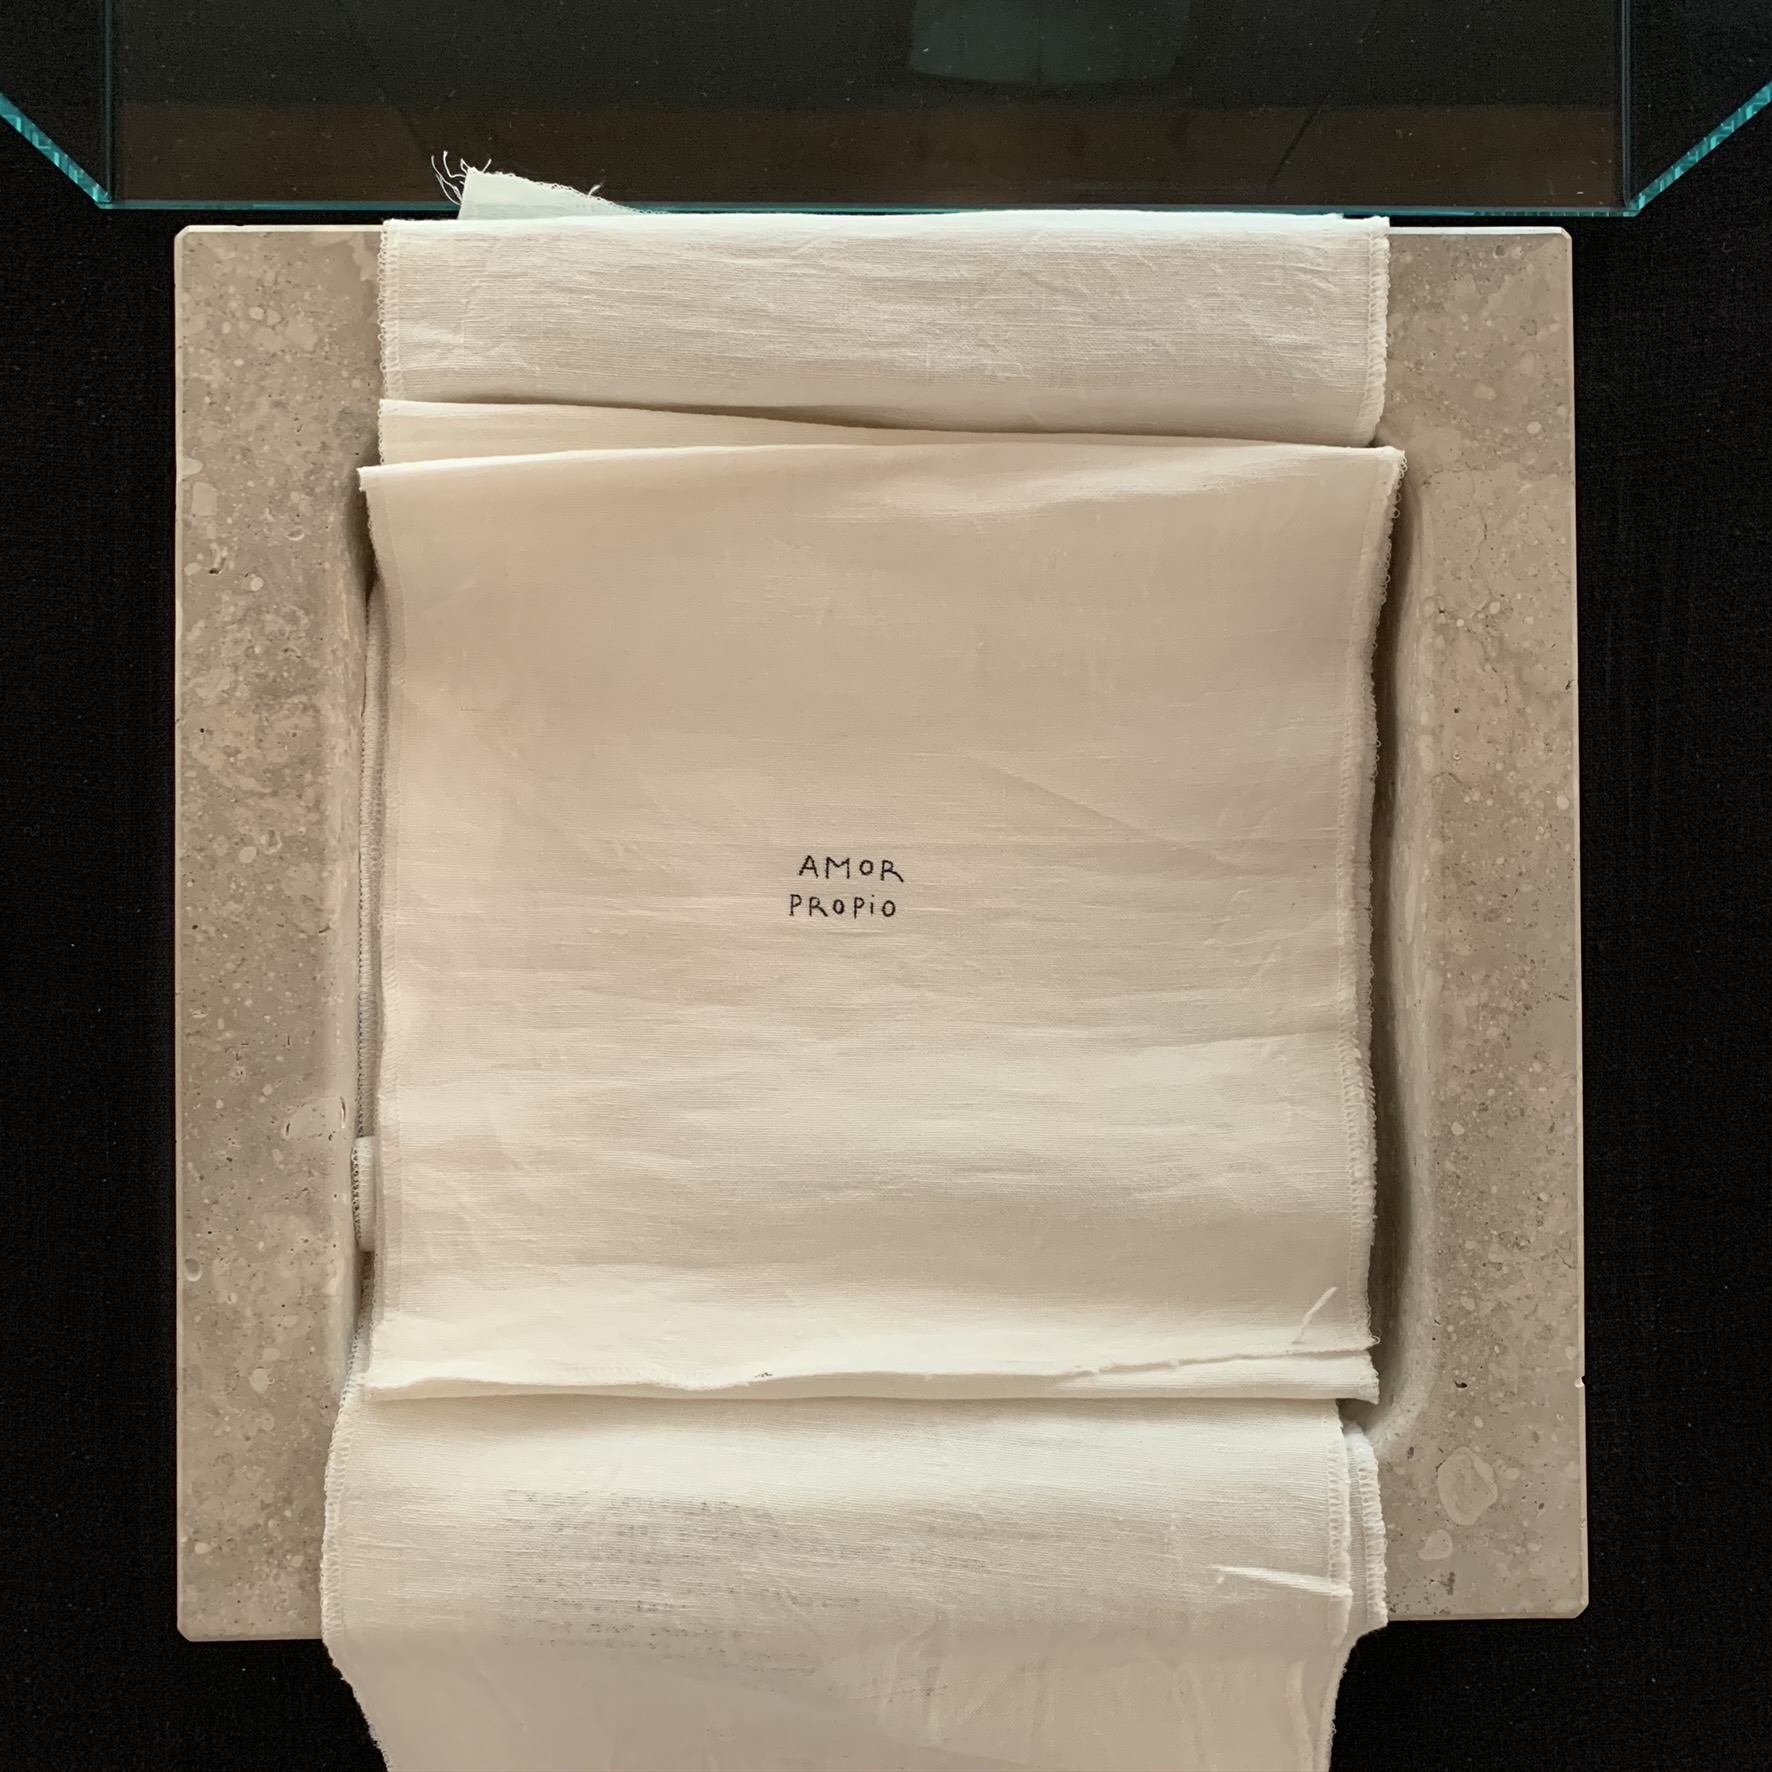 Libro-piedra 'Amor propio': Portada